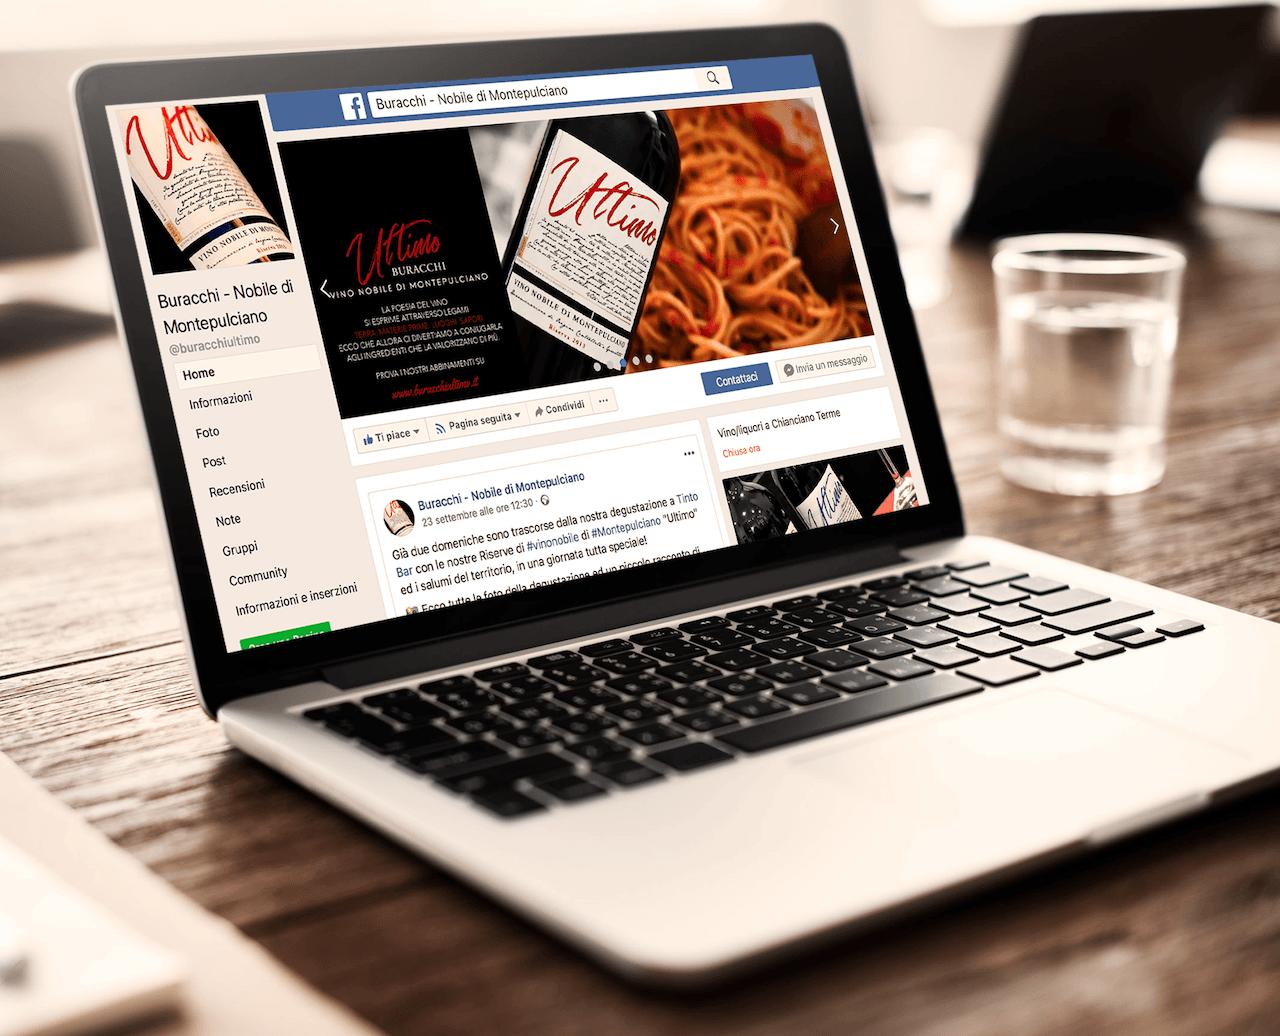 La pagina Facebook di Az. Agr. Buracchi: Buracchi - Vino Nobile di Montepulciano